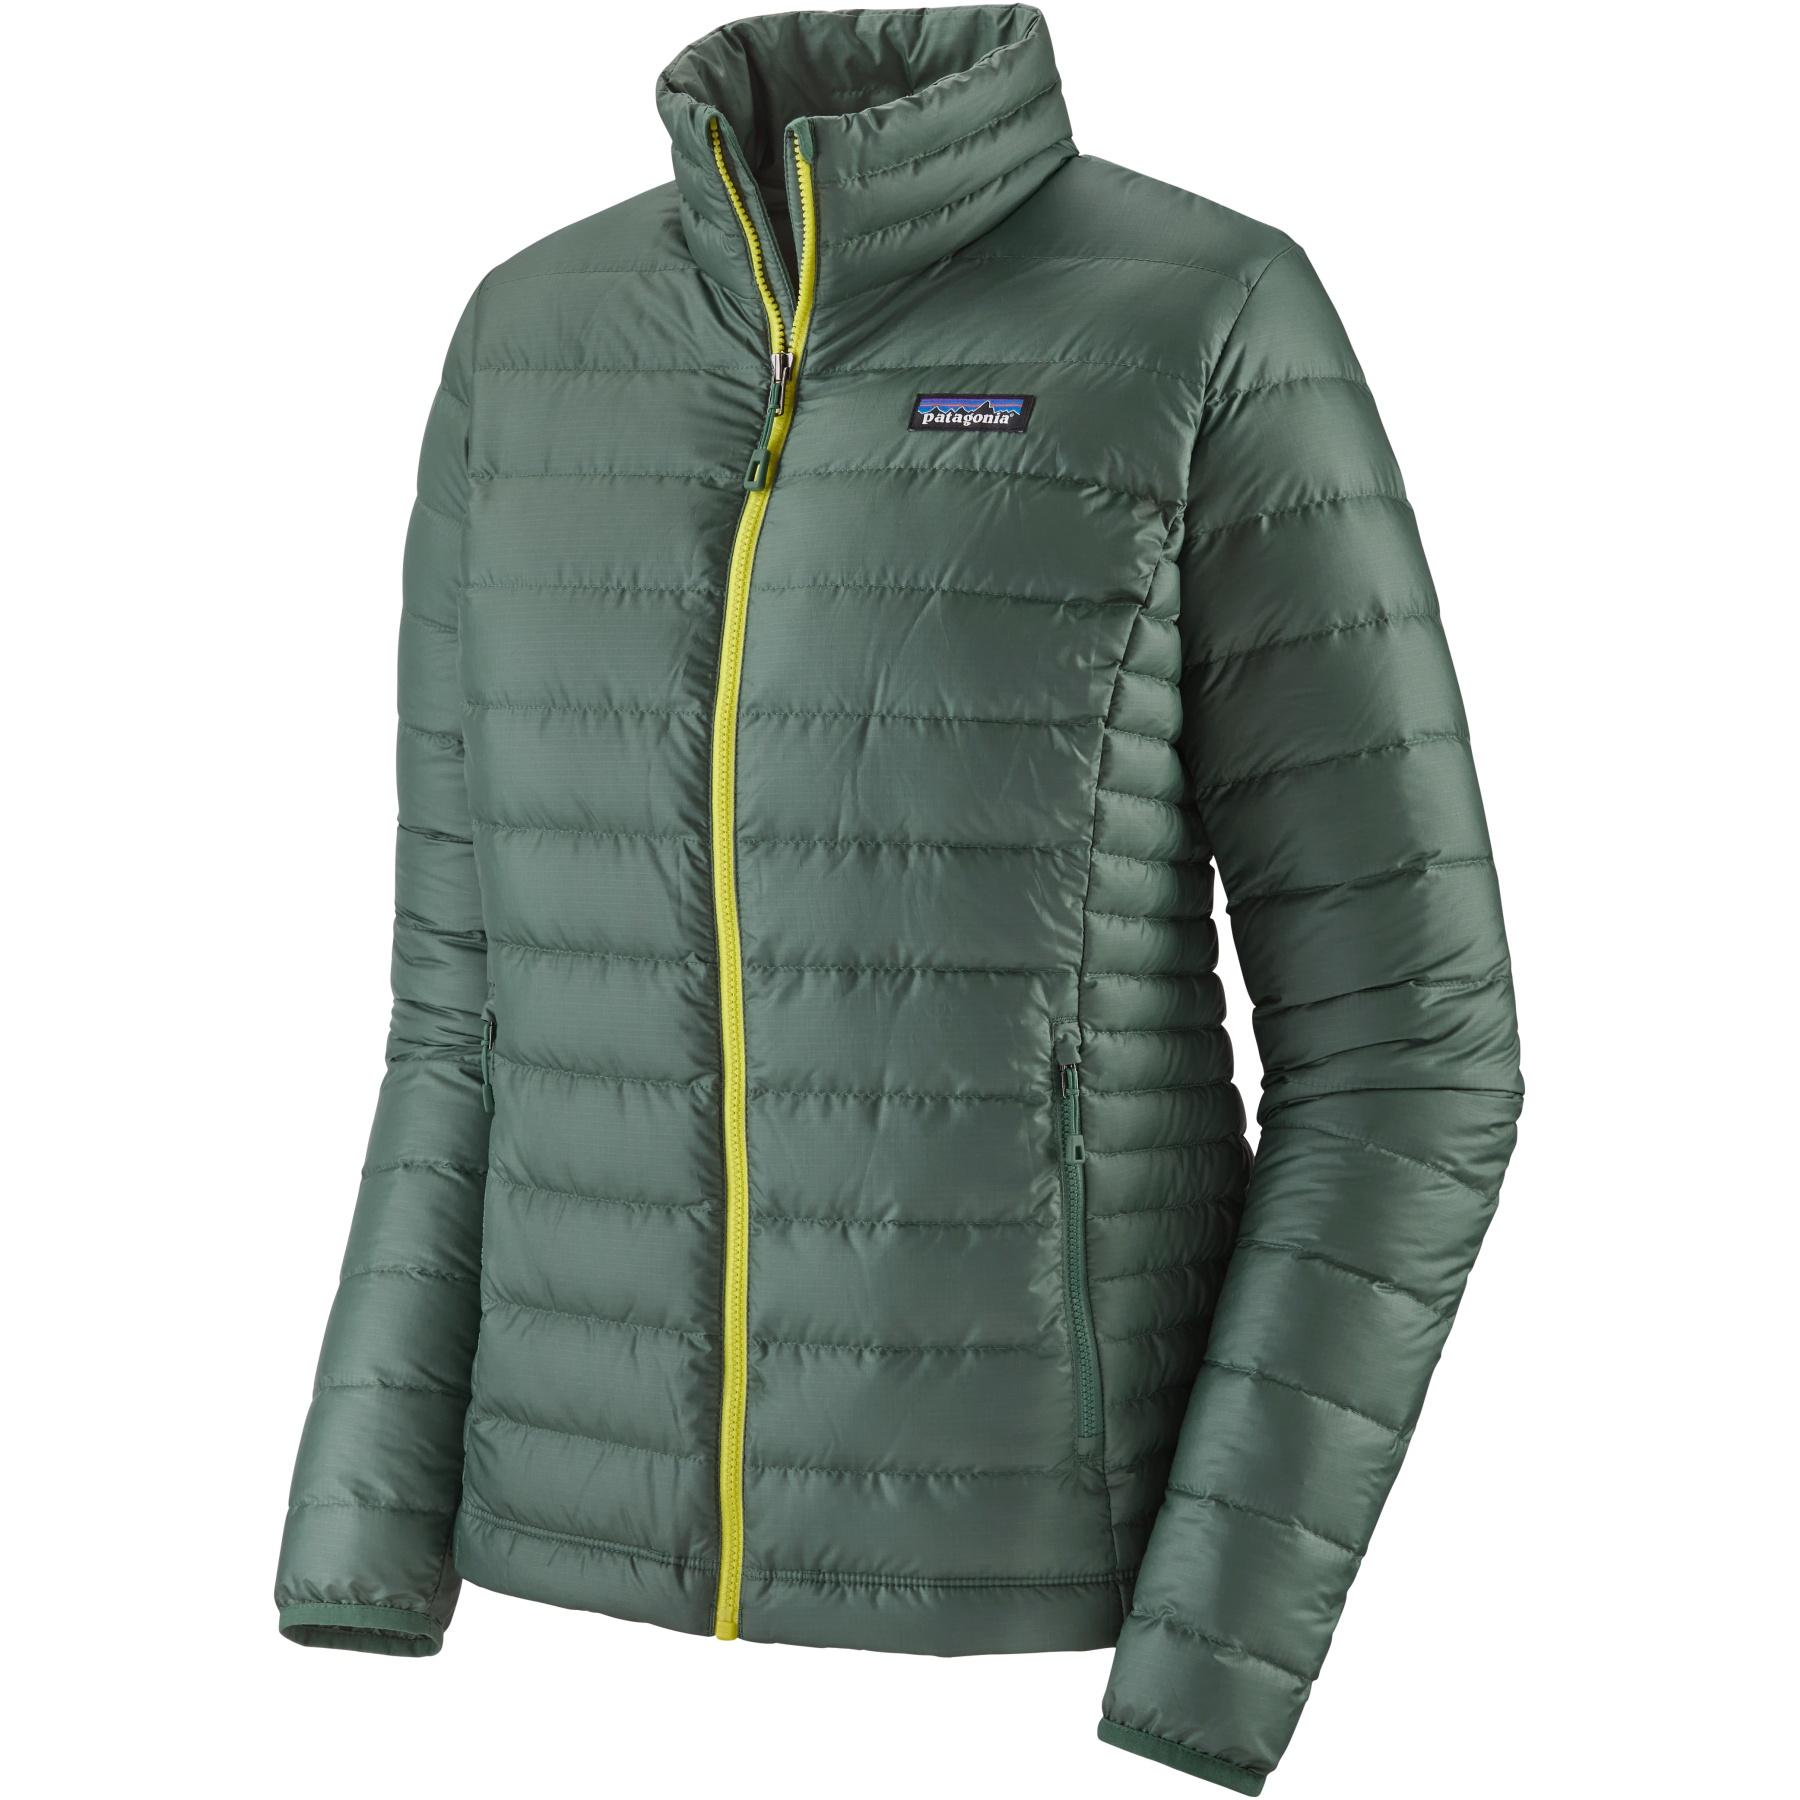 Patagonia Down Sweater Damen Daunenjacke - Regen Green